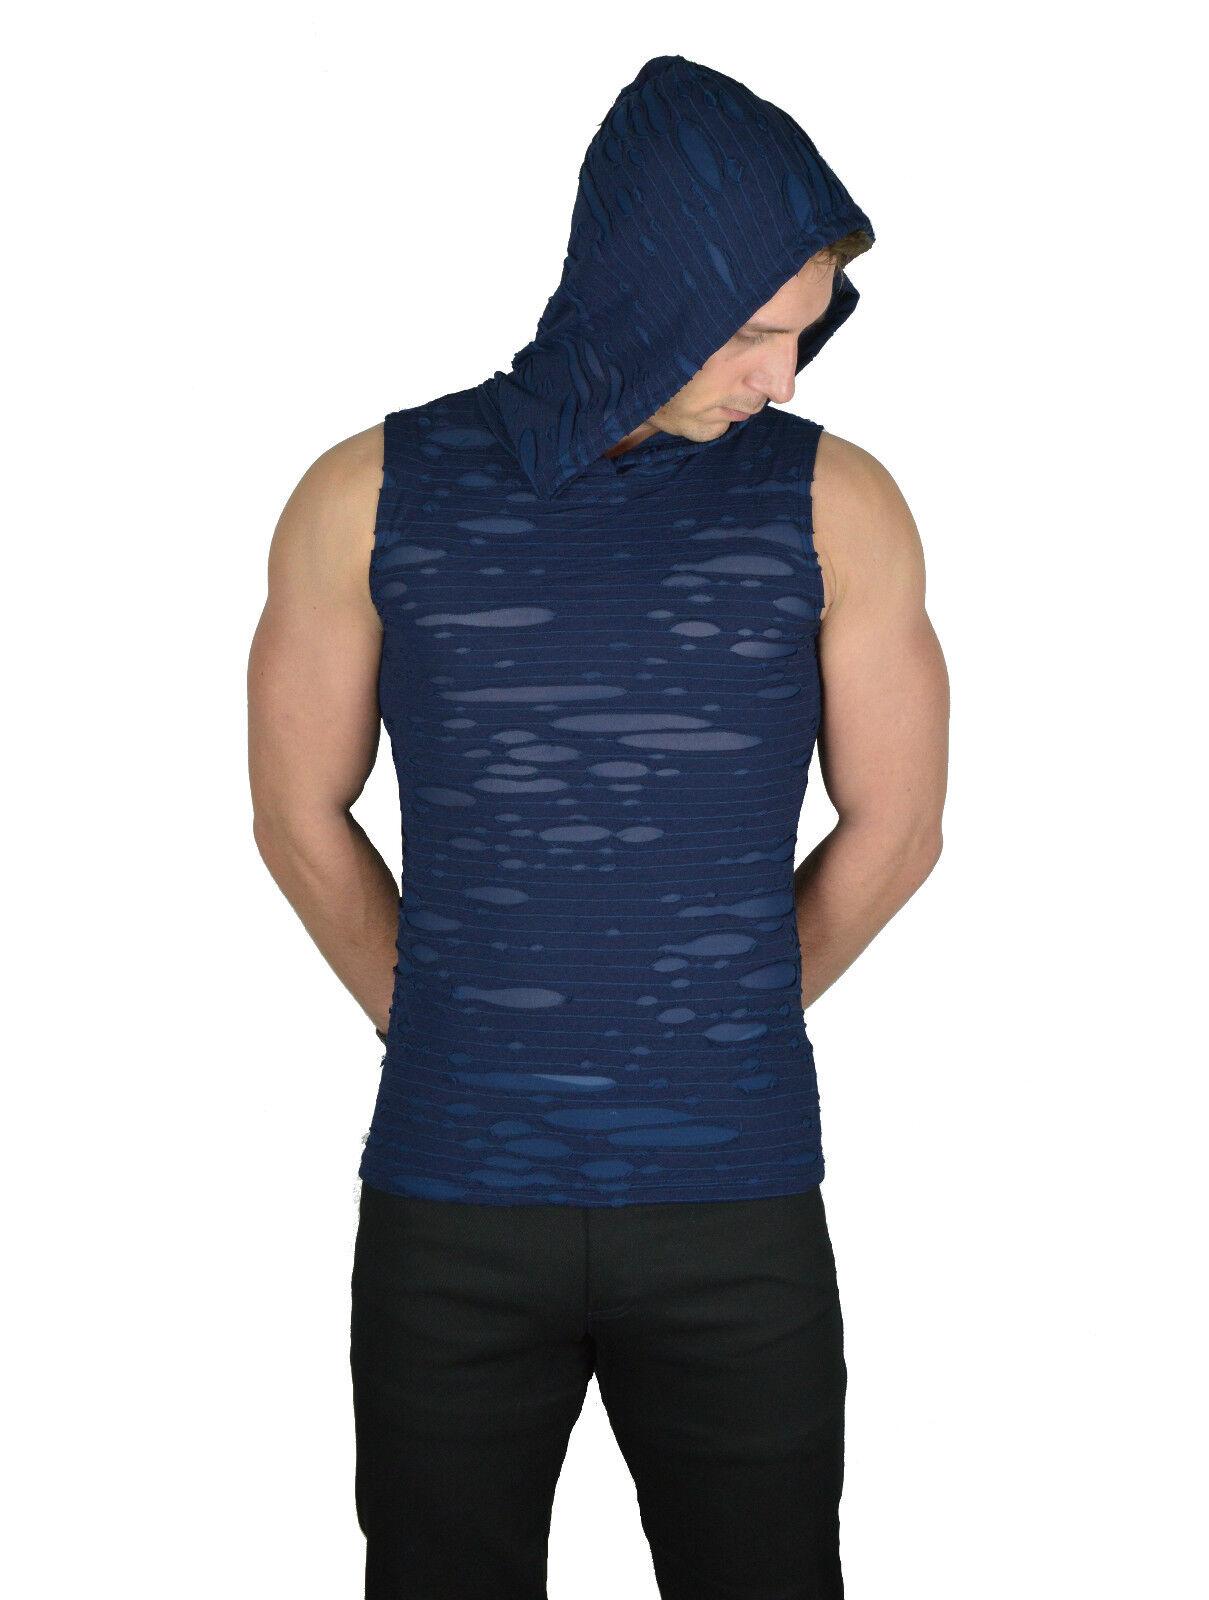 SHRINE GOTHIC RAVE PUNK CYBER EMO TECHNO BURNING MAN BLUE DECAYED SHIRT HOODIE Activewear